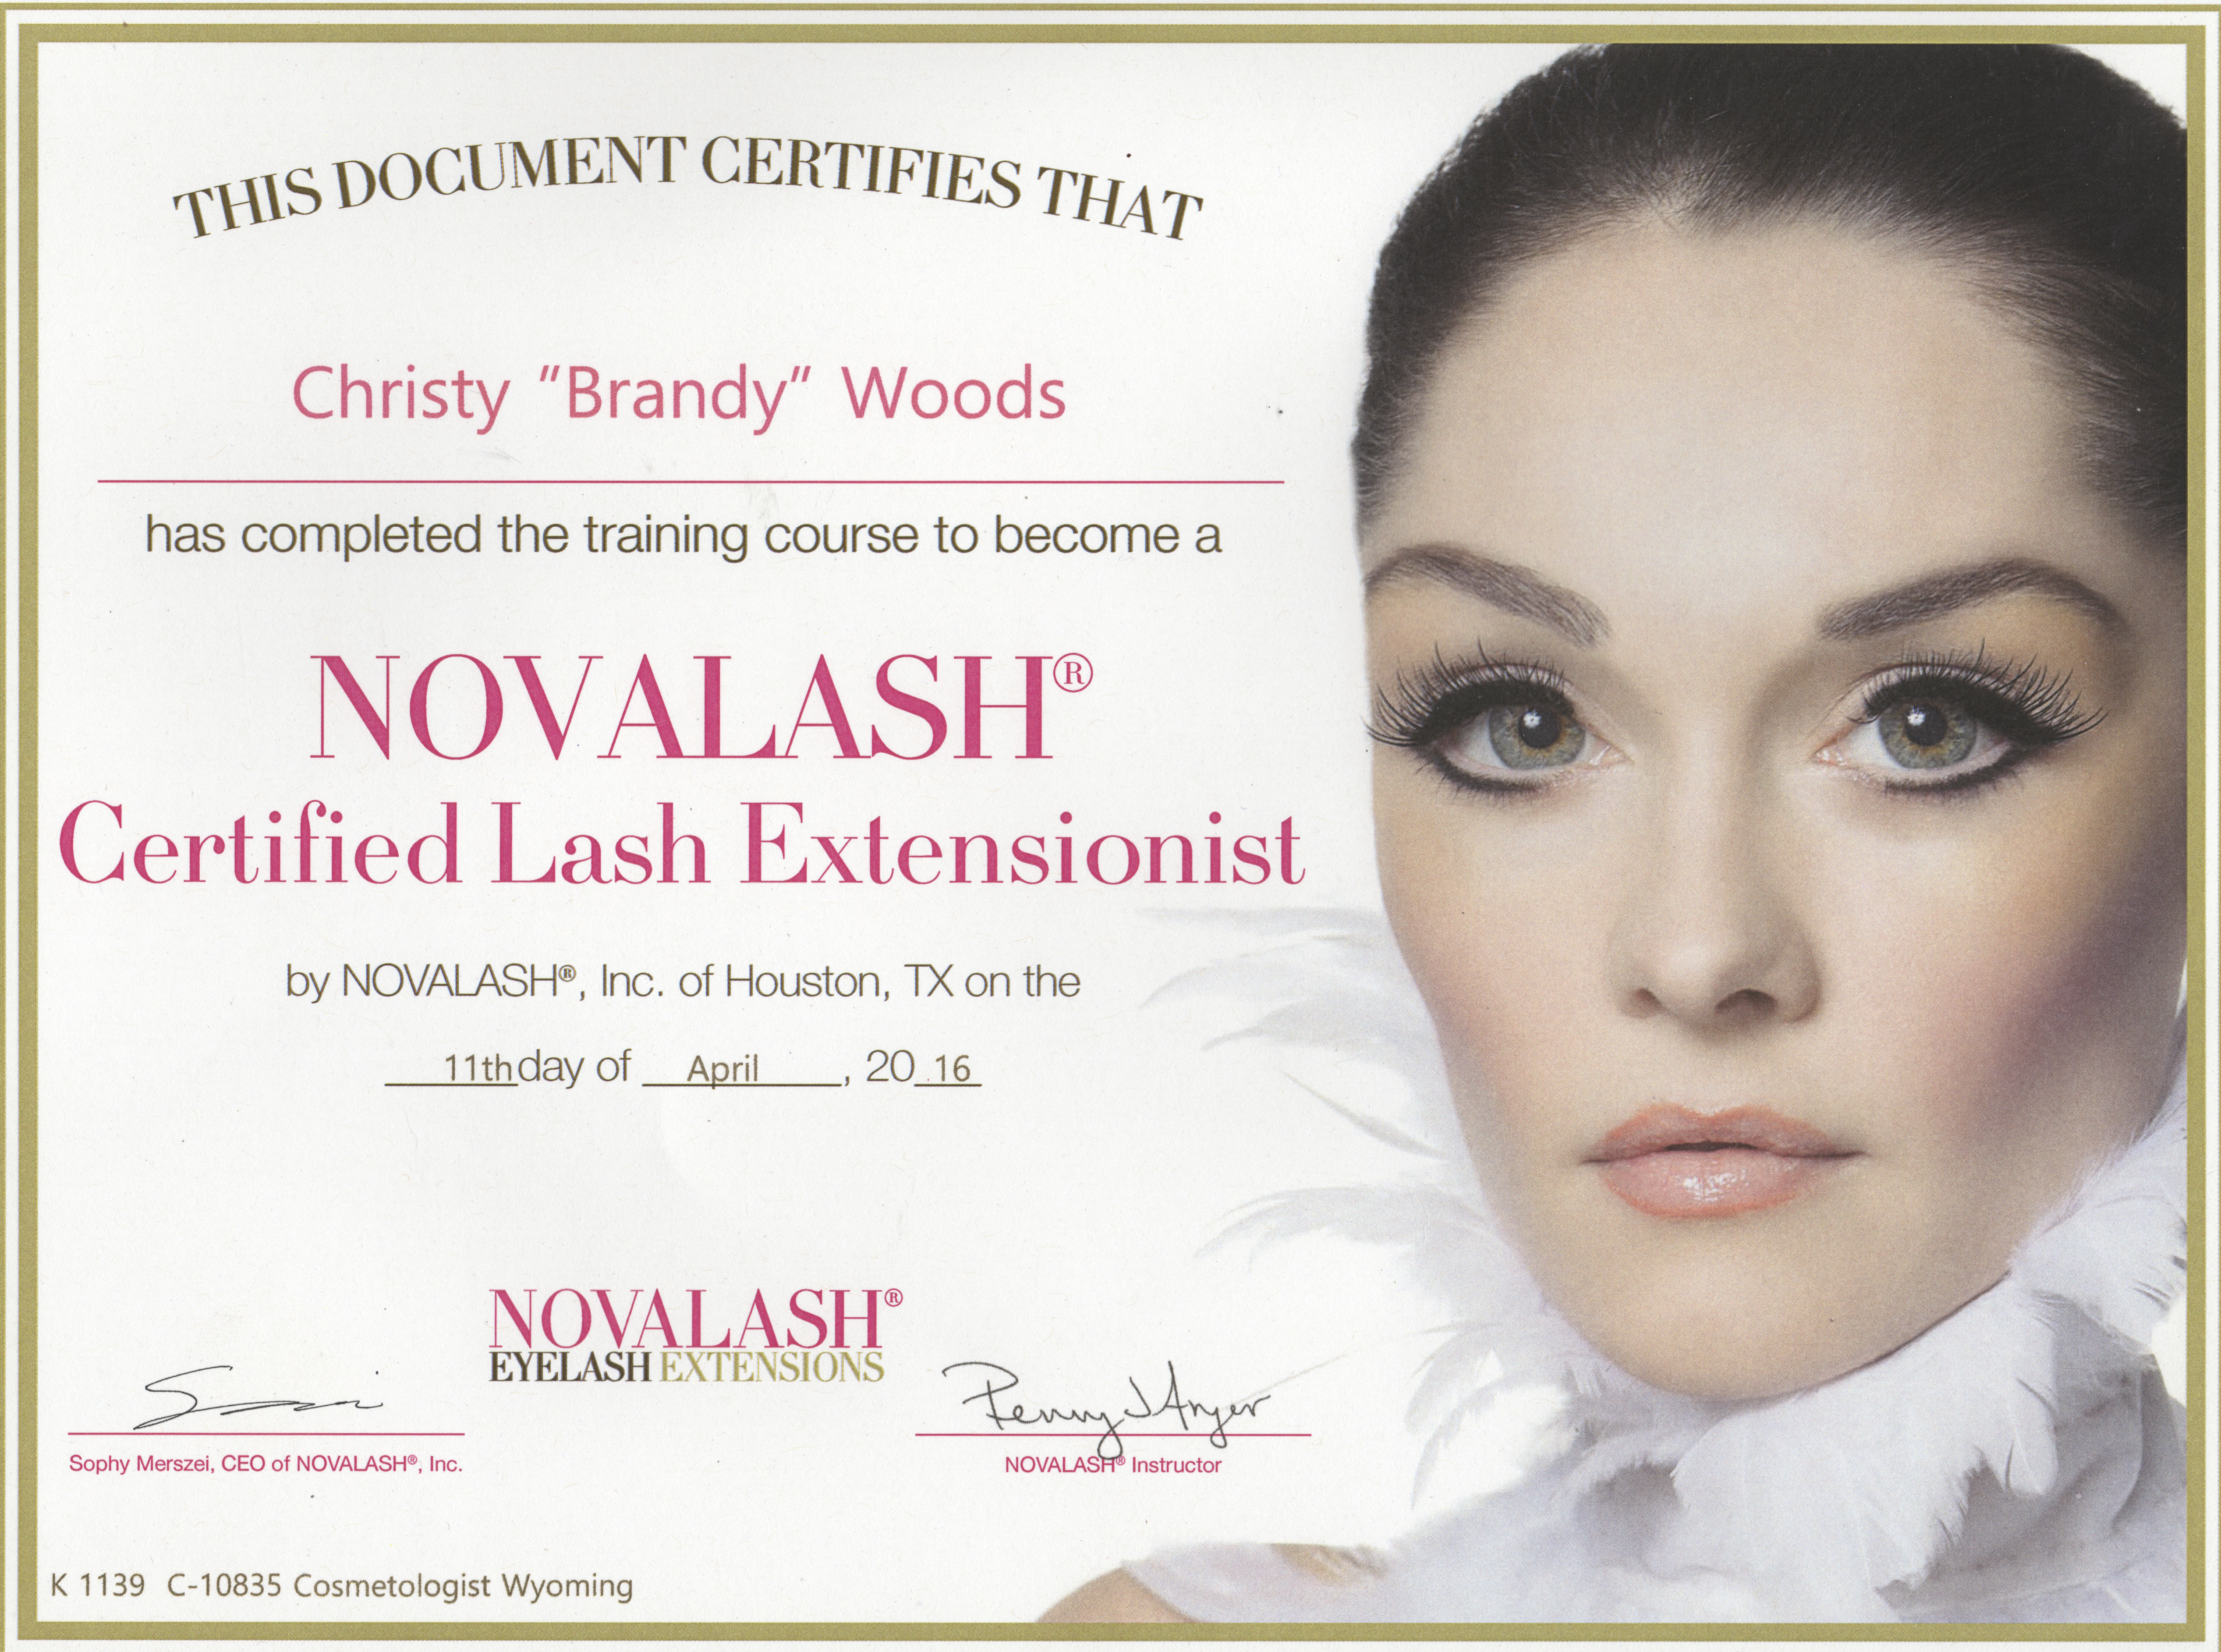 Novalash Certified